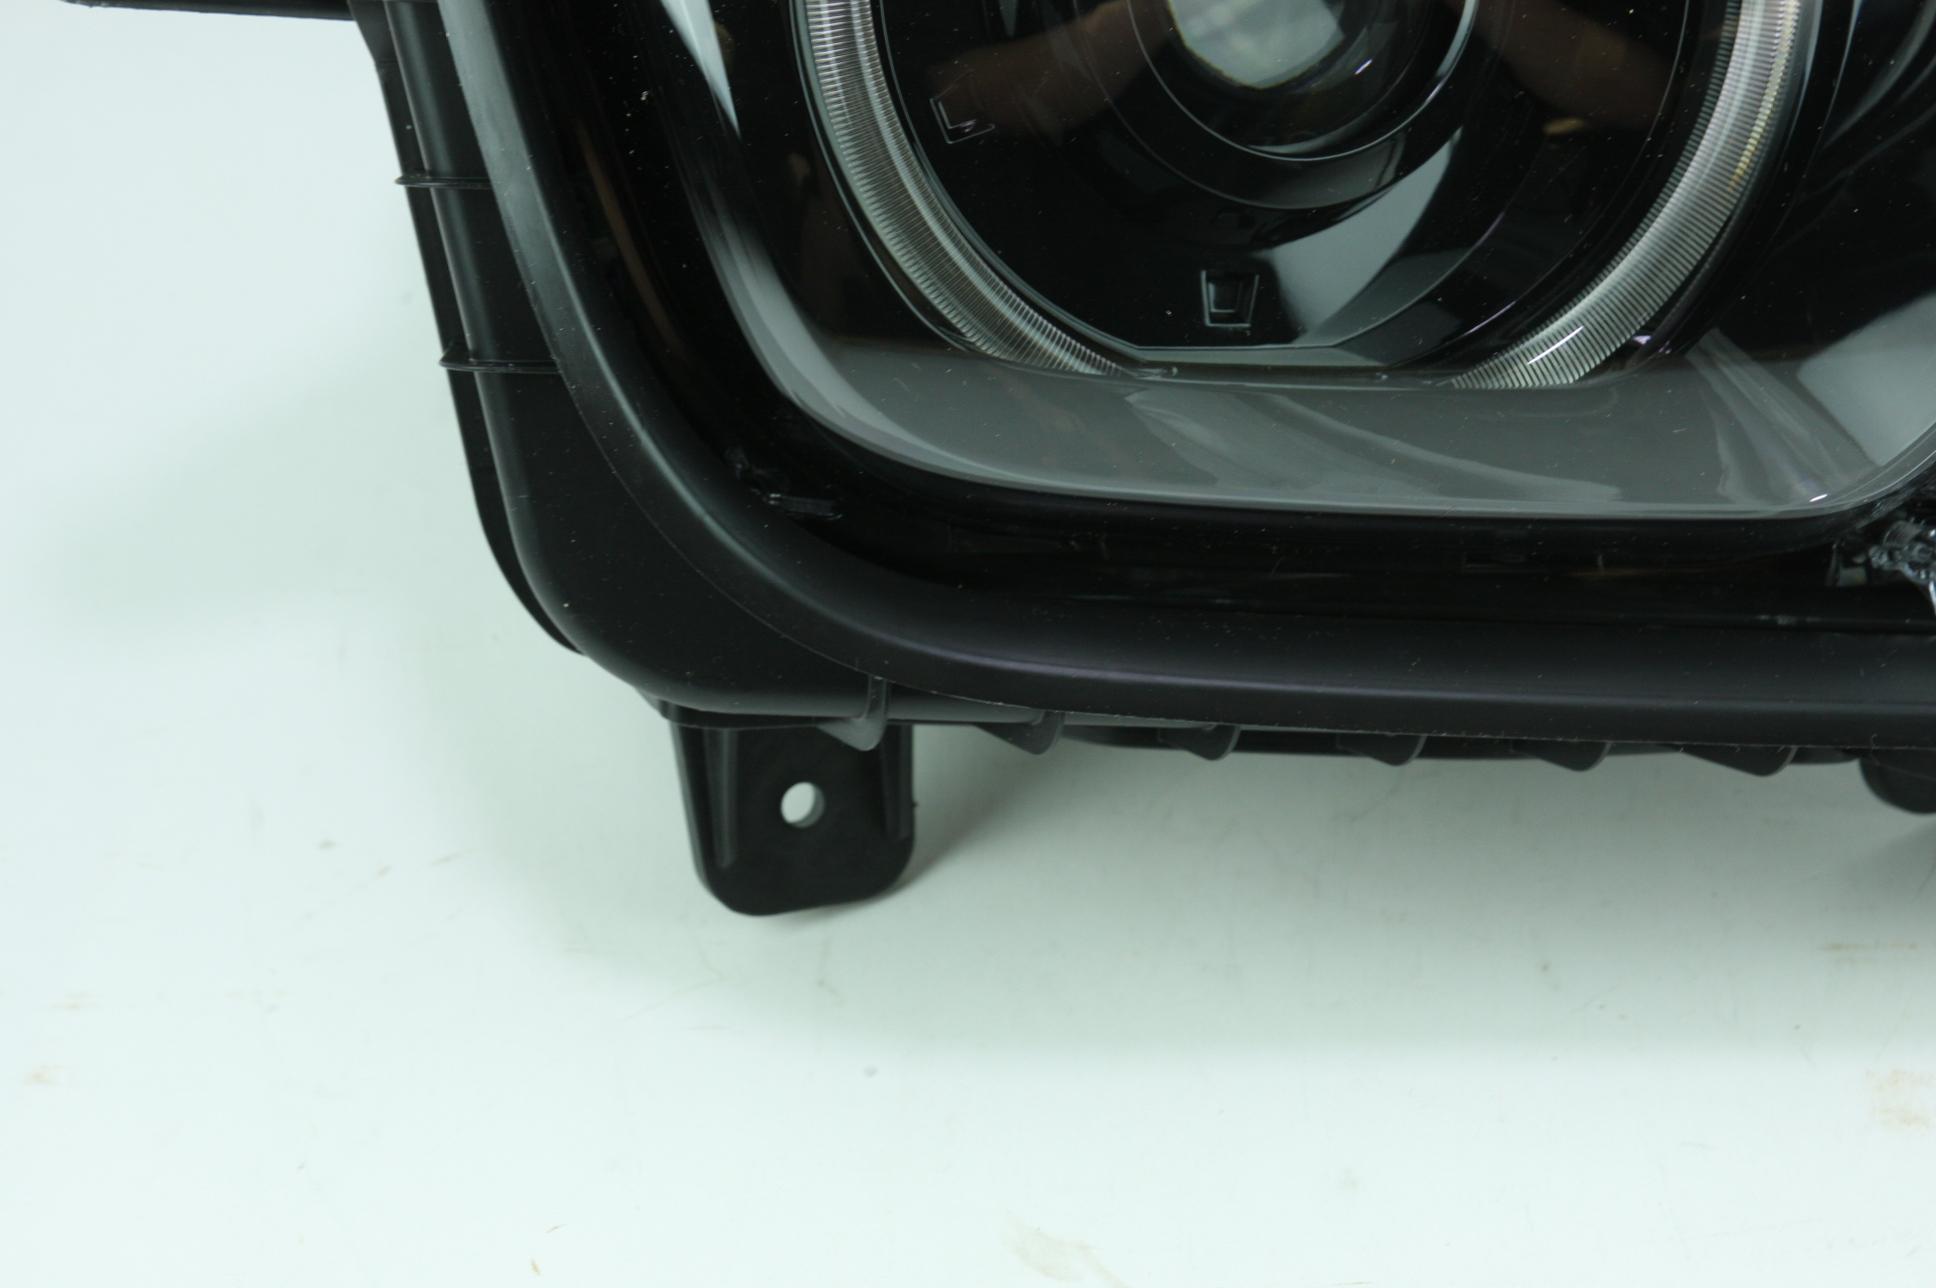 New Genuine OEM GM 22959920 Right Headlight Assembly 10-15 Chevy Camaro NIP - image 5